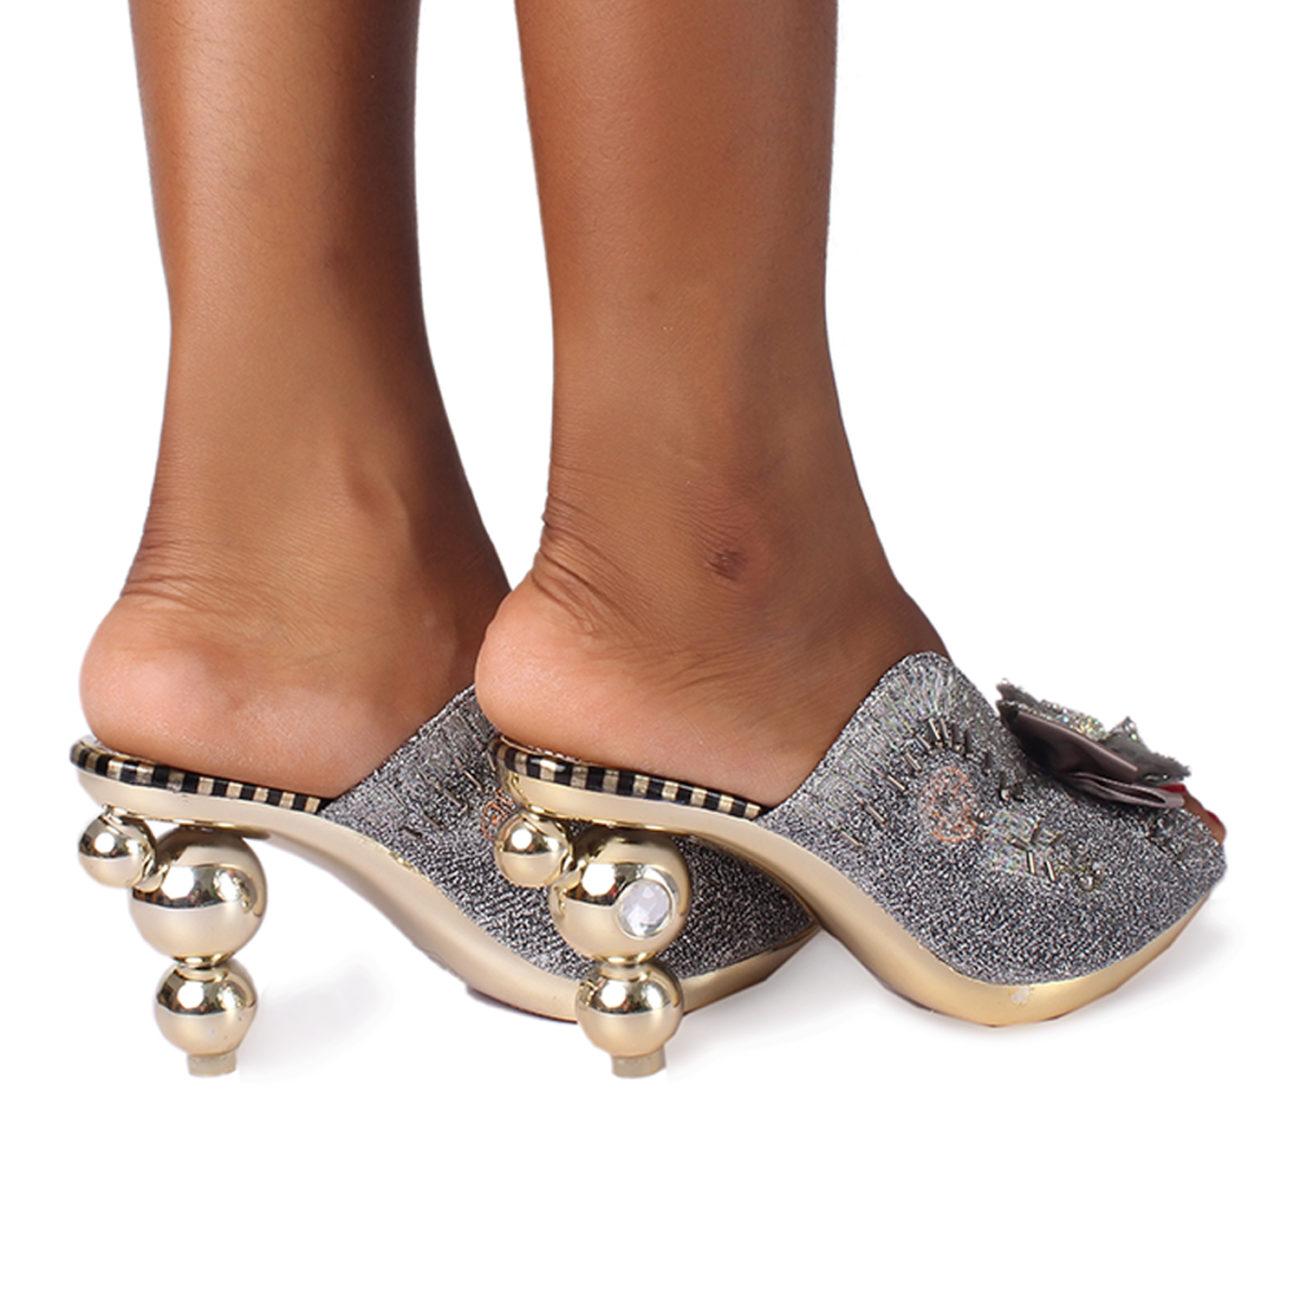 b32ff0aad067 John Fashion · Feelynx Online Fashion Store - John Fashion Shoes Size 42